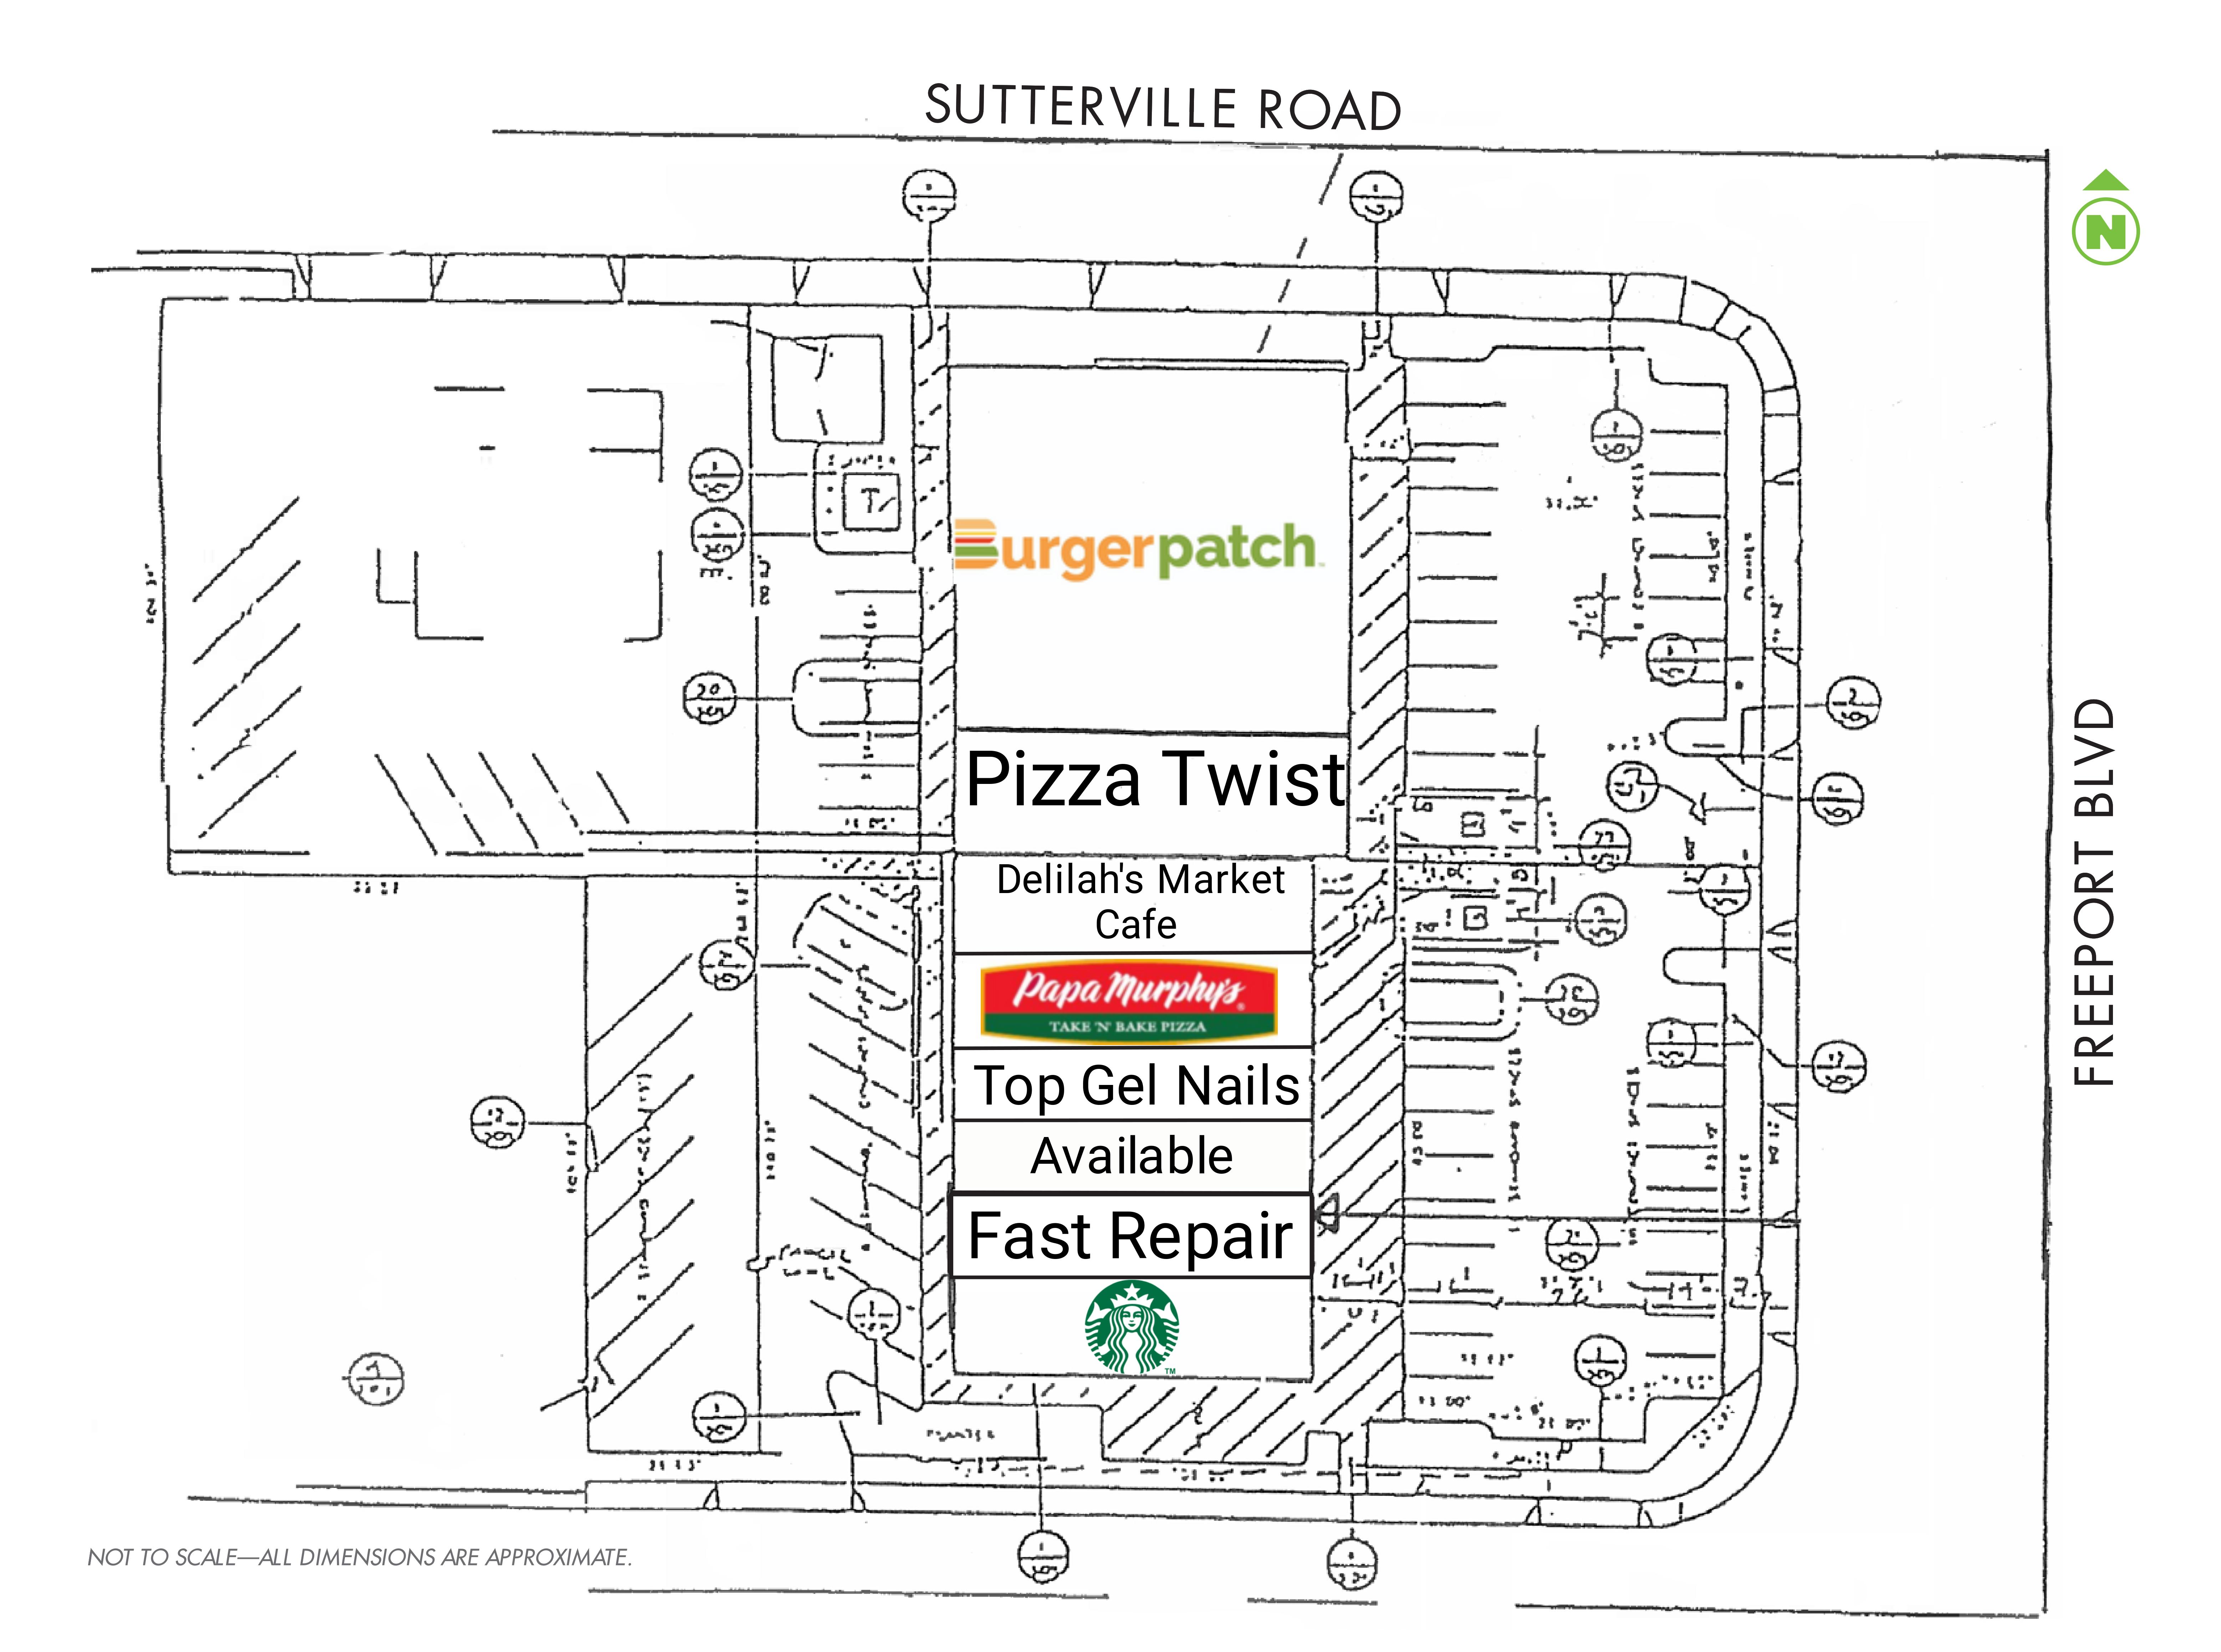 Sutterville Square: site plan